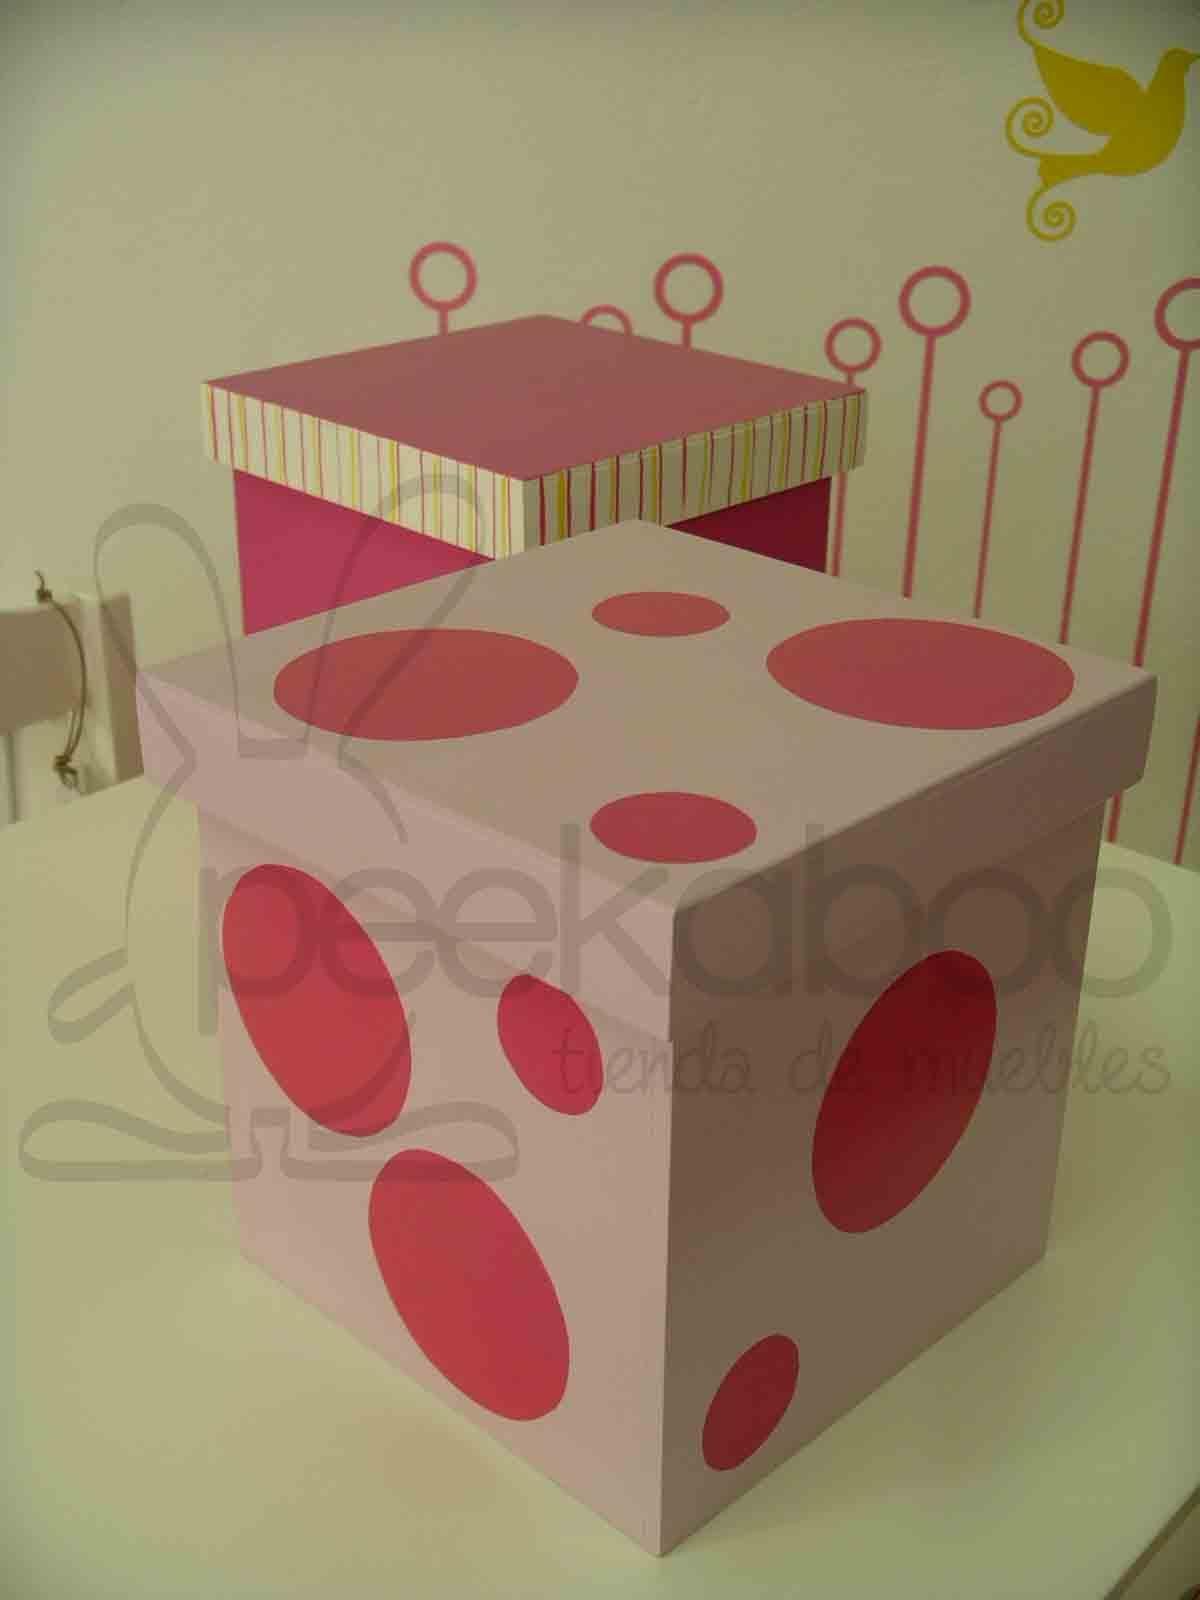 Cajas de madera infantiles imagui - Cajas infantiles decoradas ...